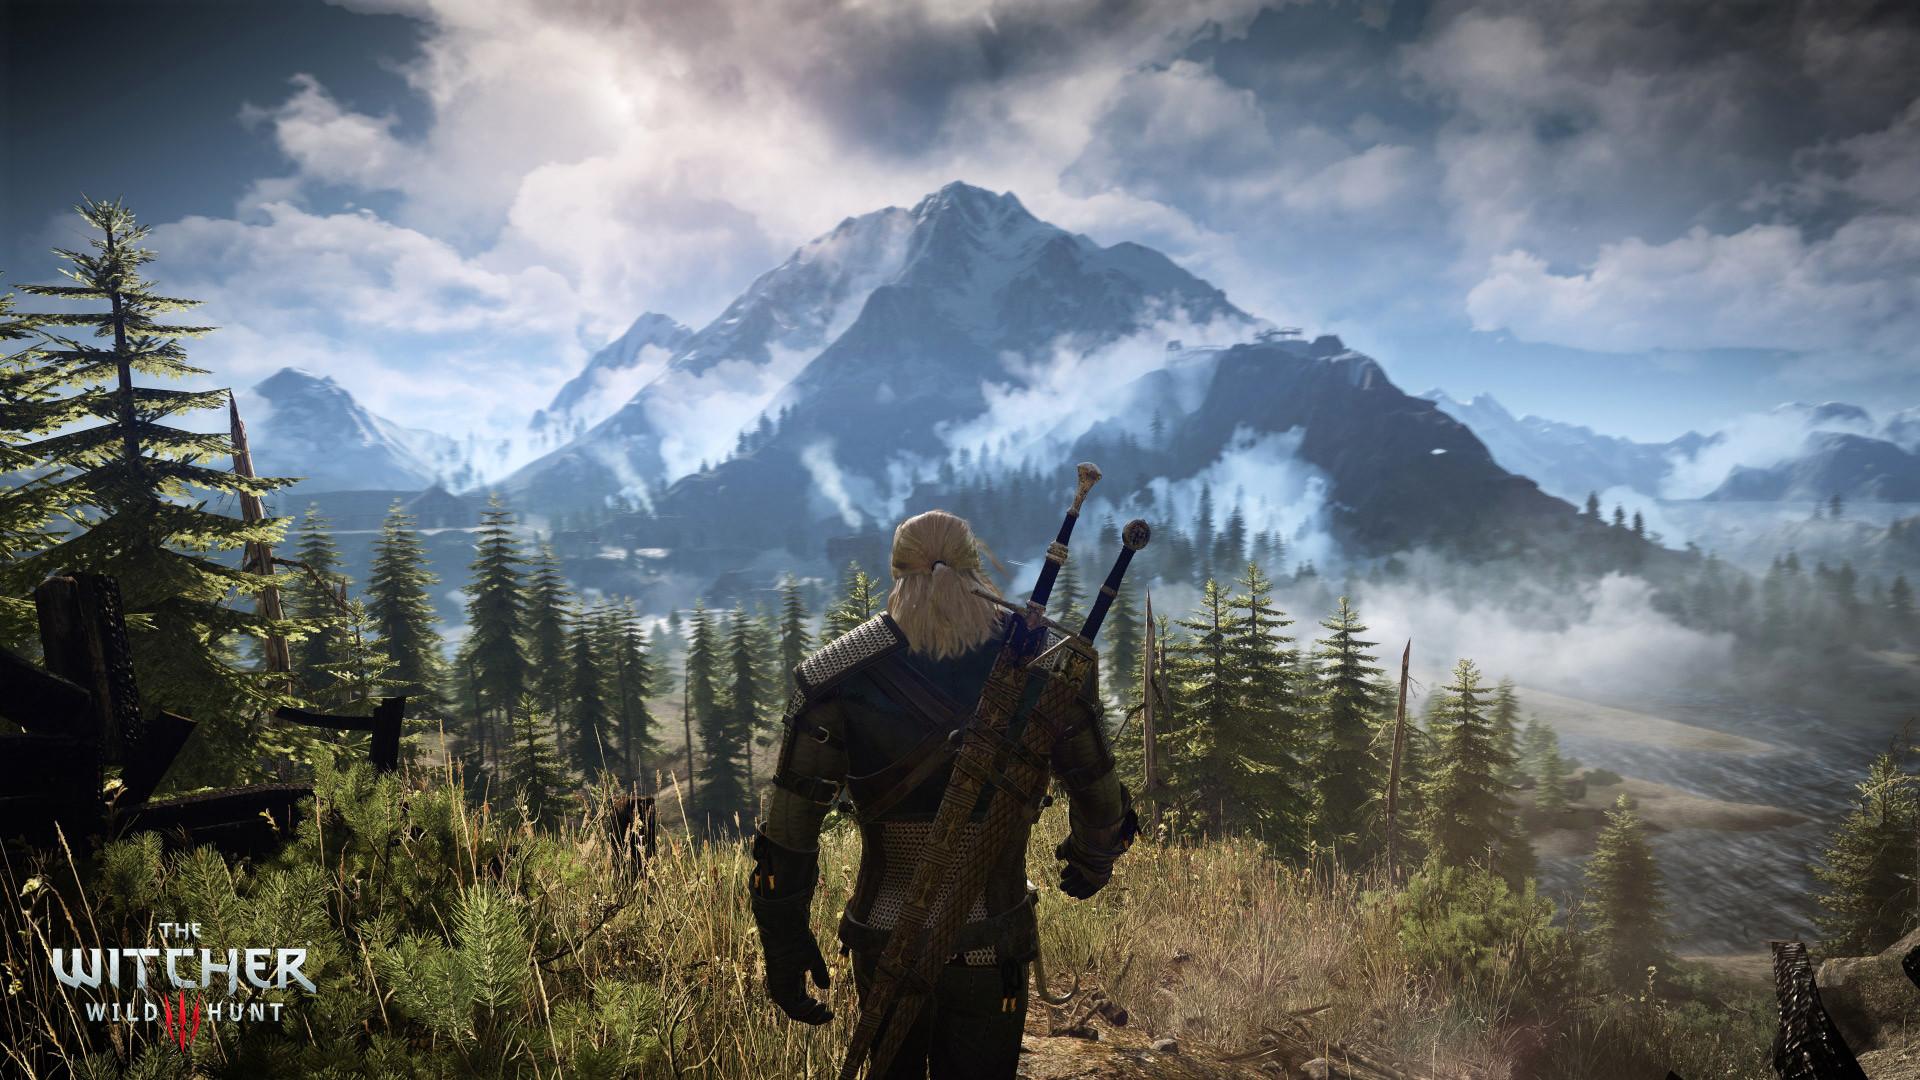 The Witcher 3: Wild Hunt wallpaper